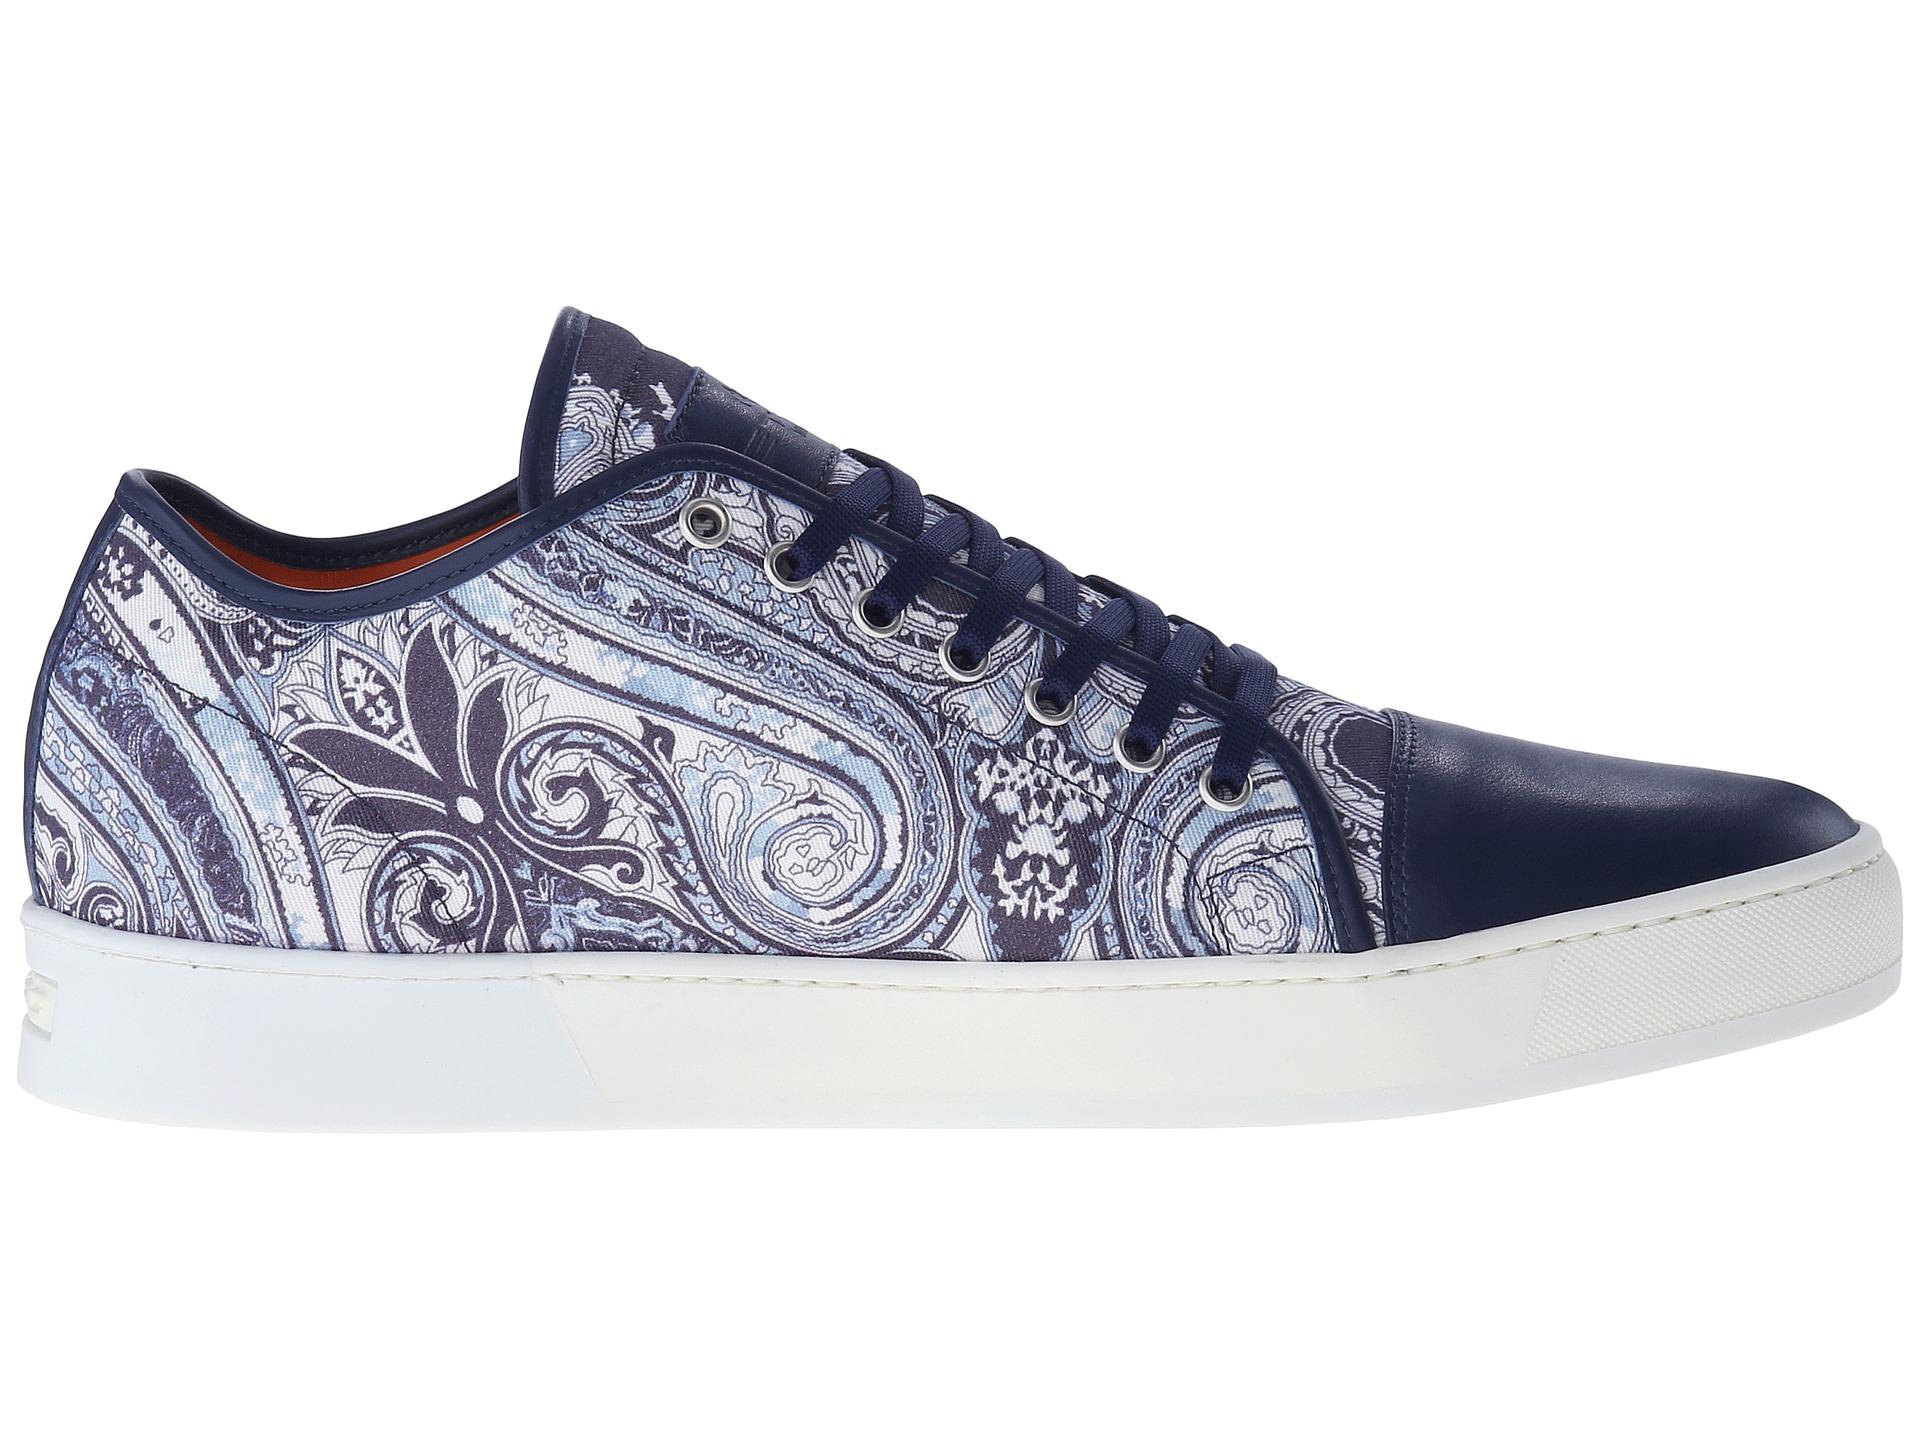 van volkswagen occasion - Etro Paisley Leather Toe Sneaker in Blue for Men | Lyst